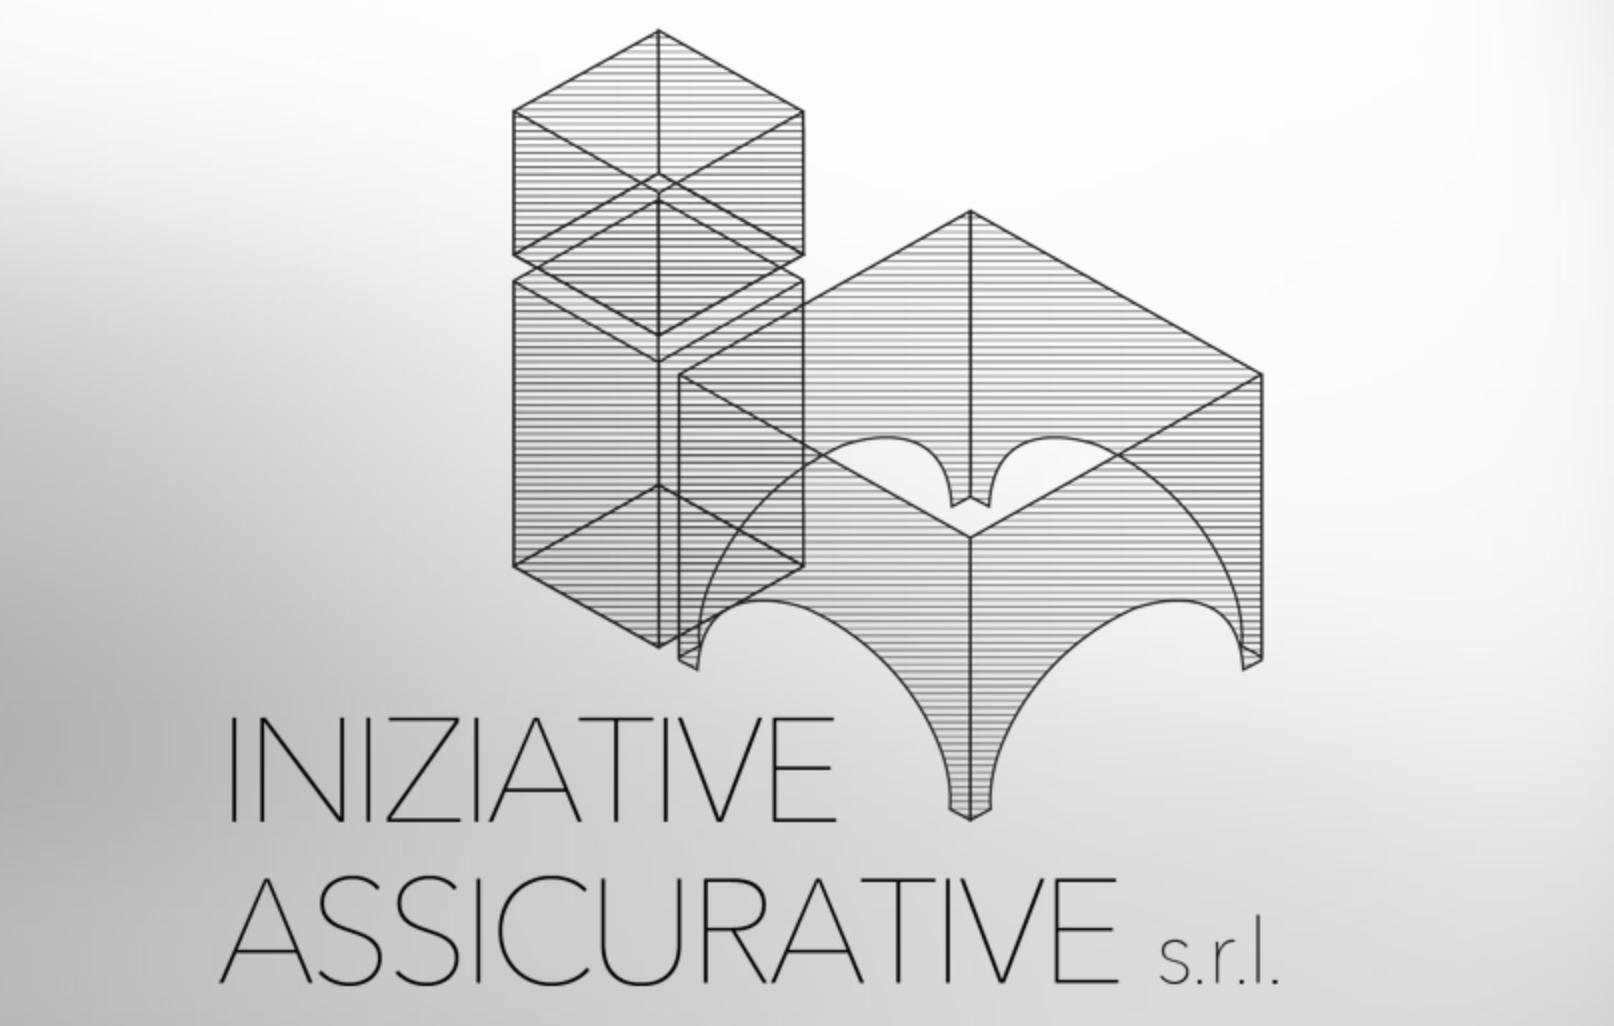 Iniziative Assicurative S.r.l.